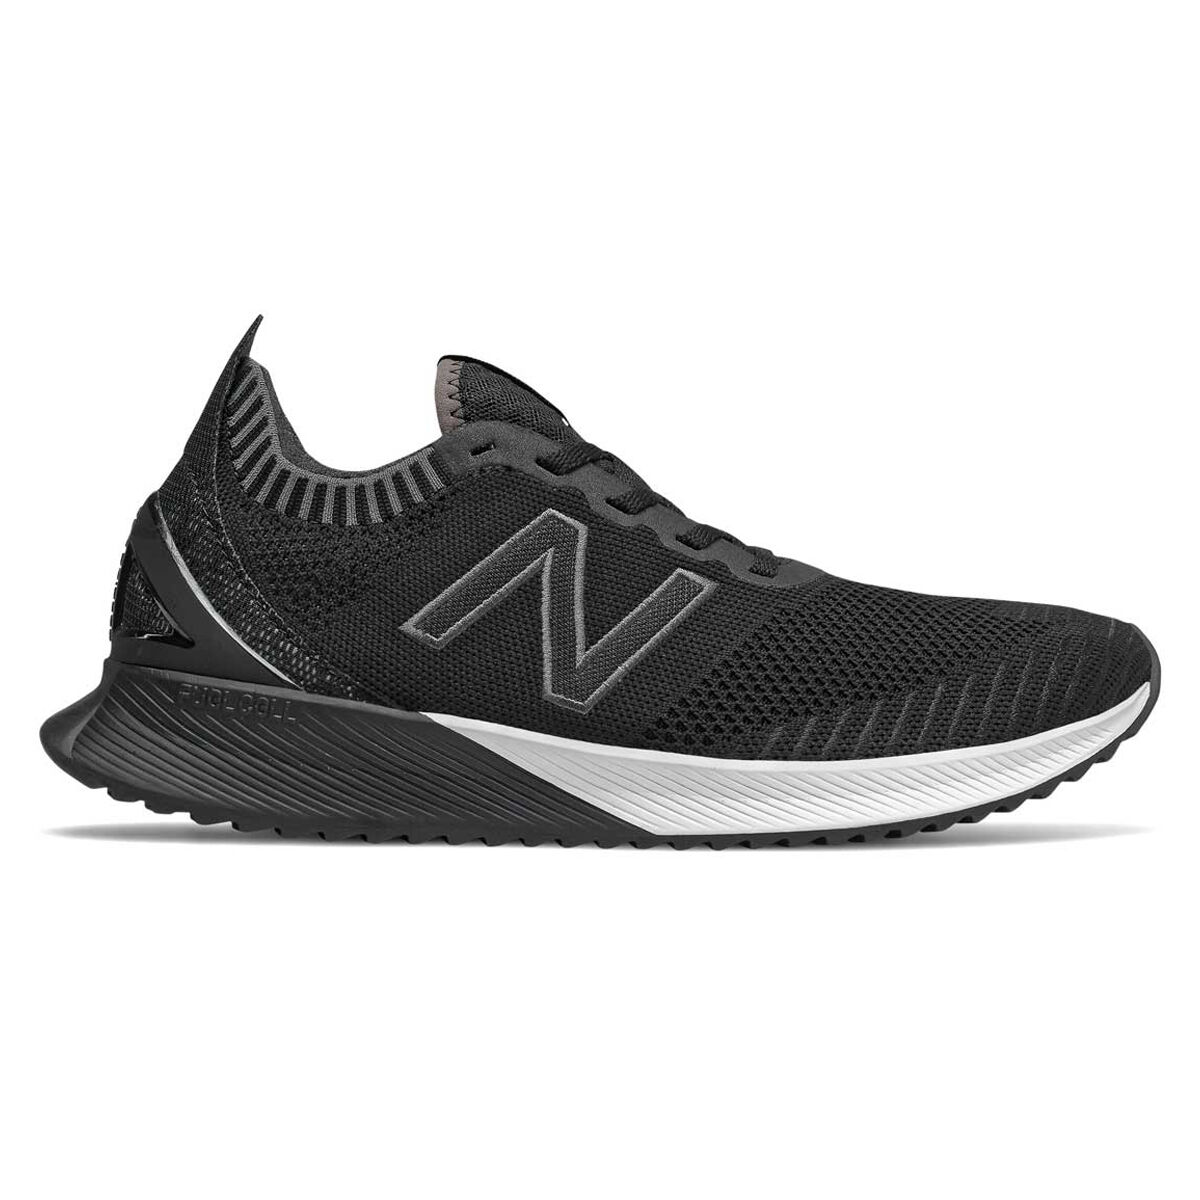 New Balance Echo Mens Running Shoes